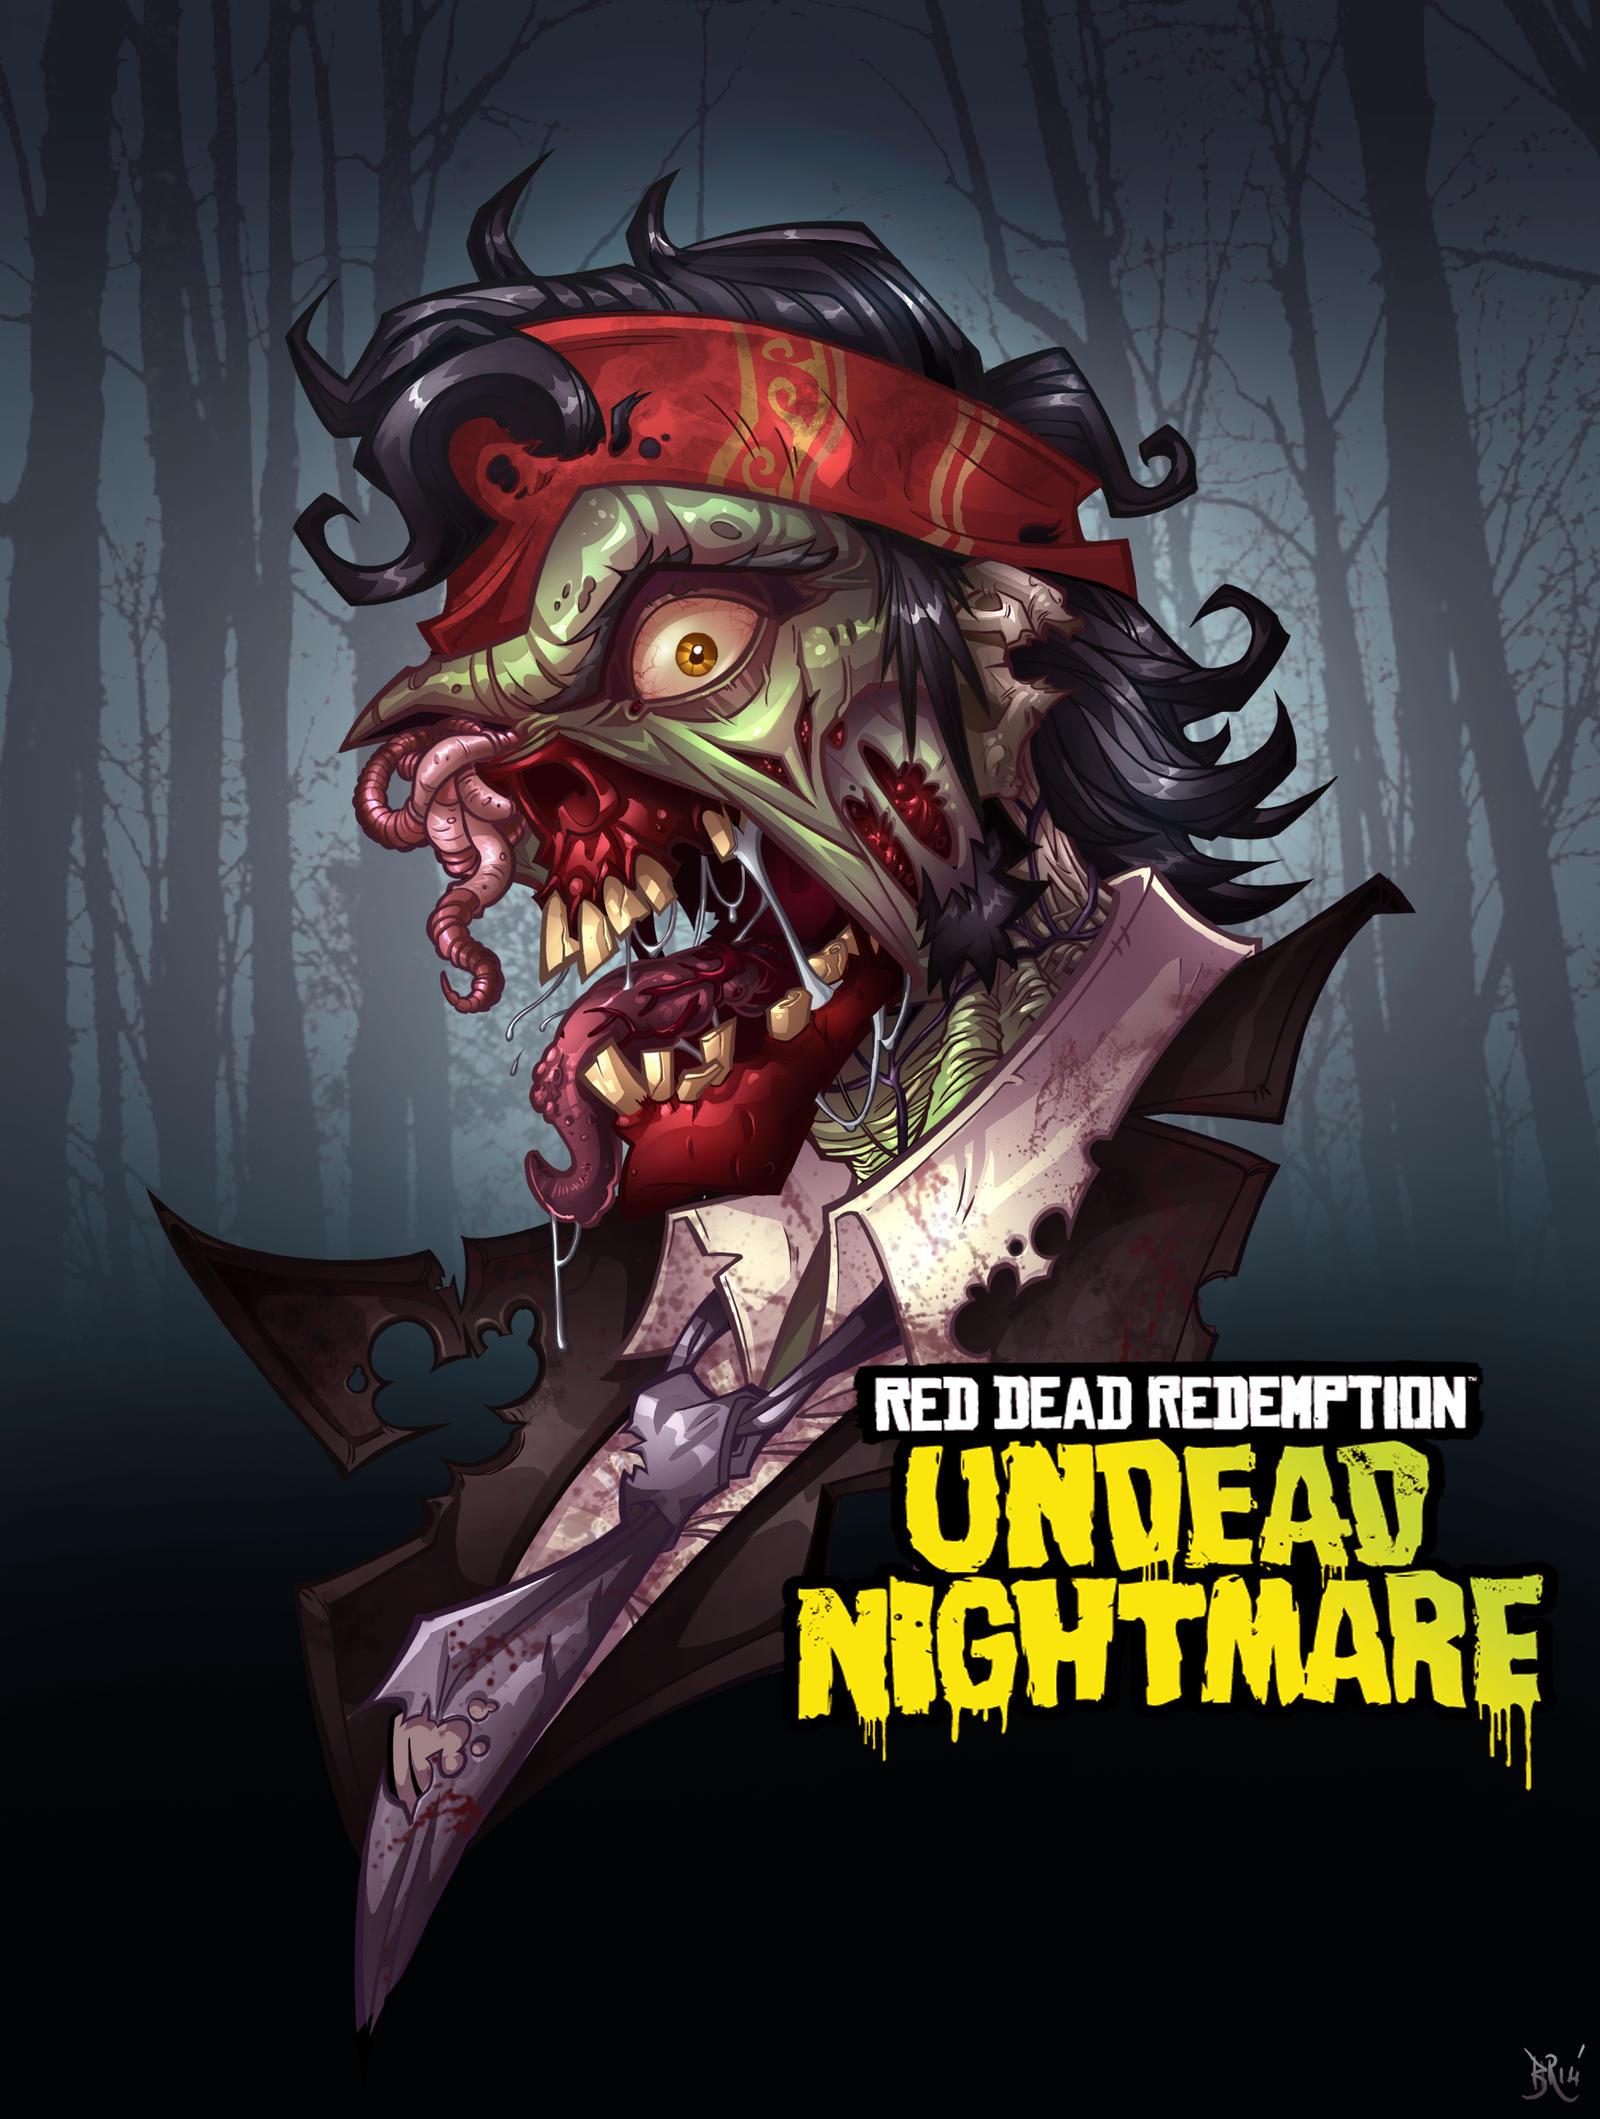 Red Dead Redemption Undead Nightmare By Bing Ratnapala On Deviantart